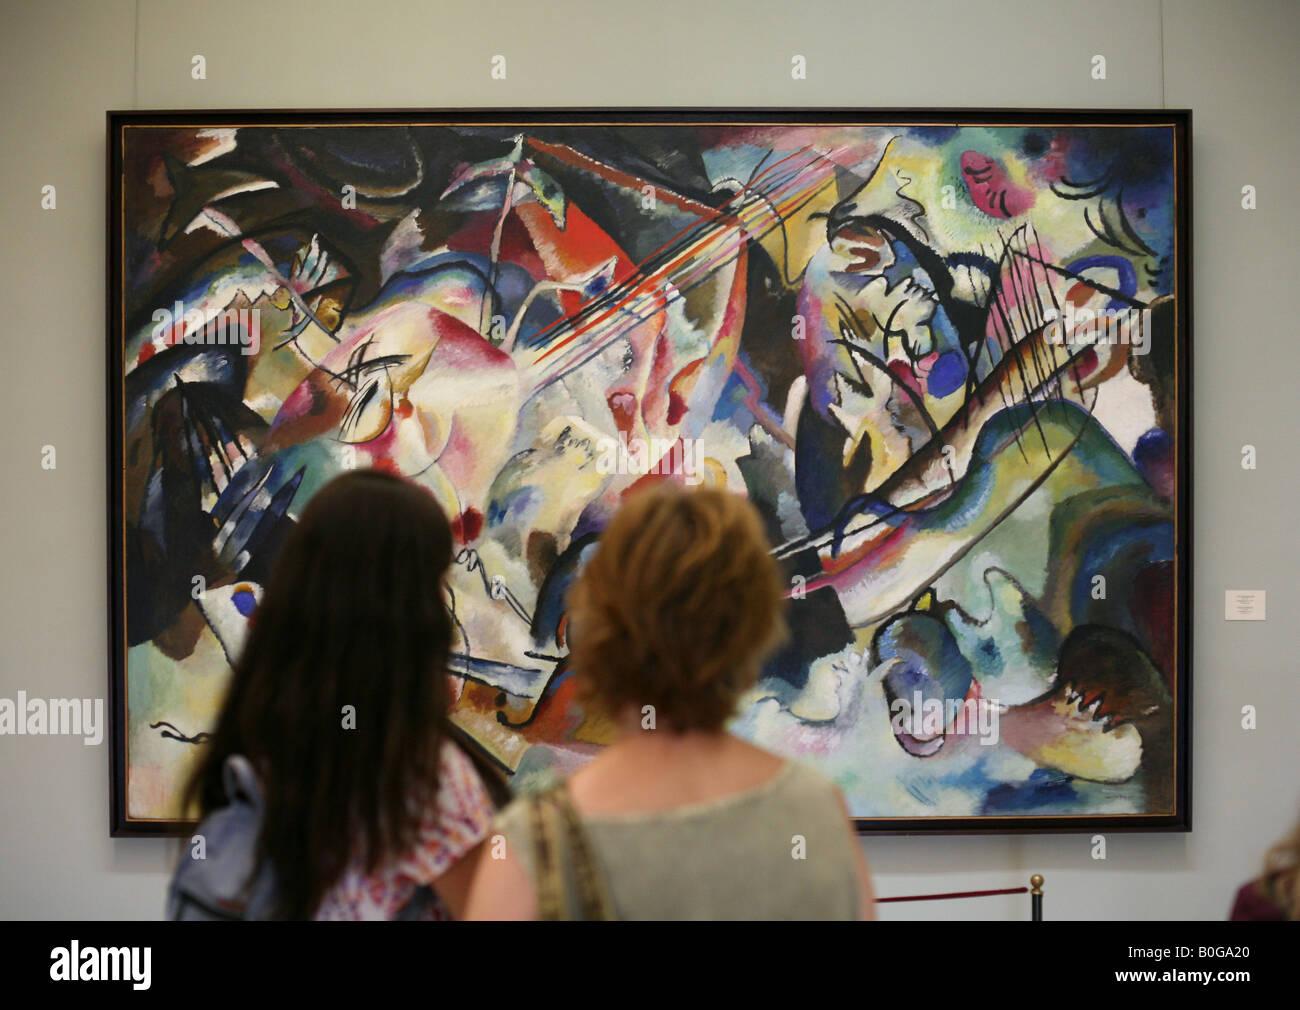 Wassily Kandinsky Composition